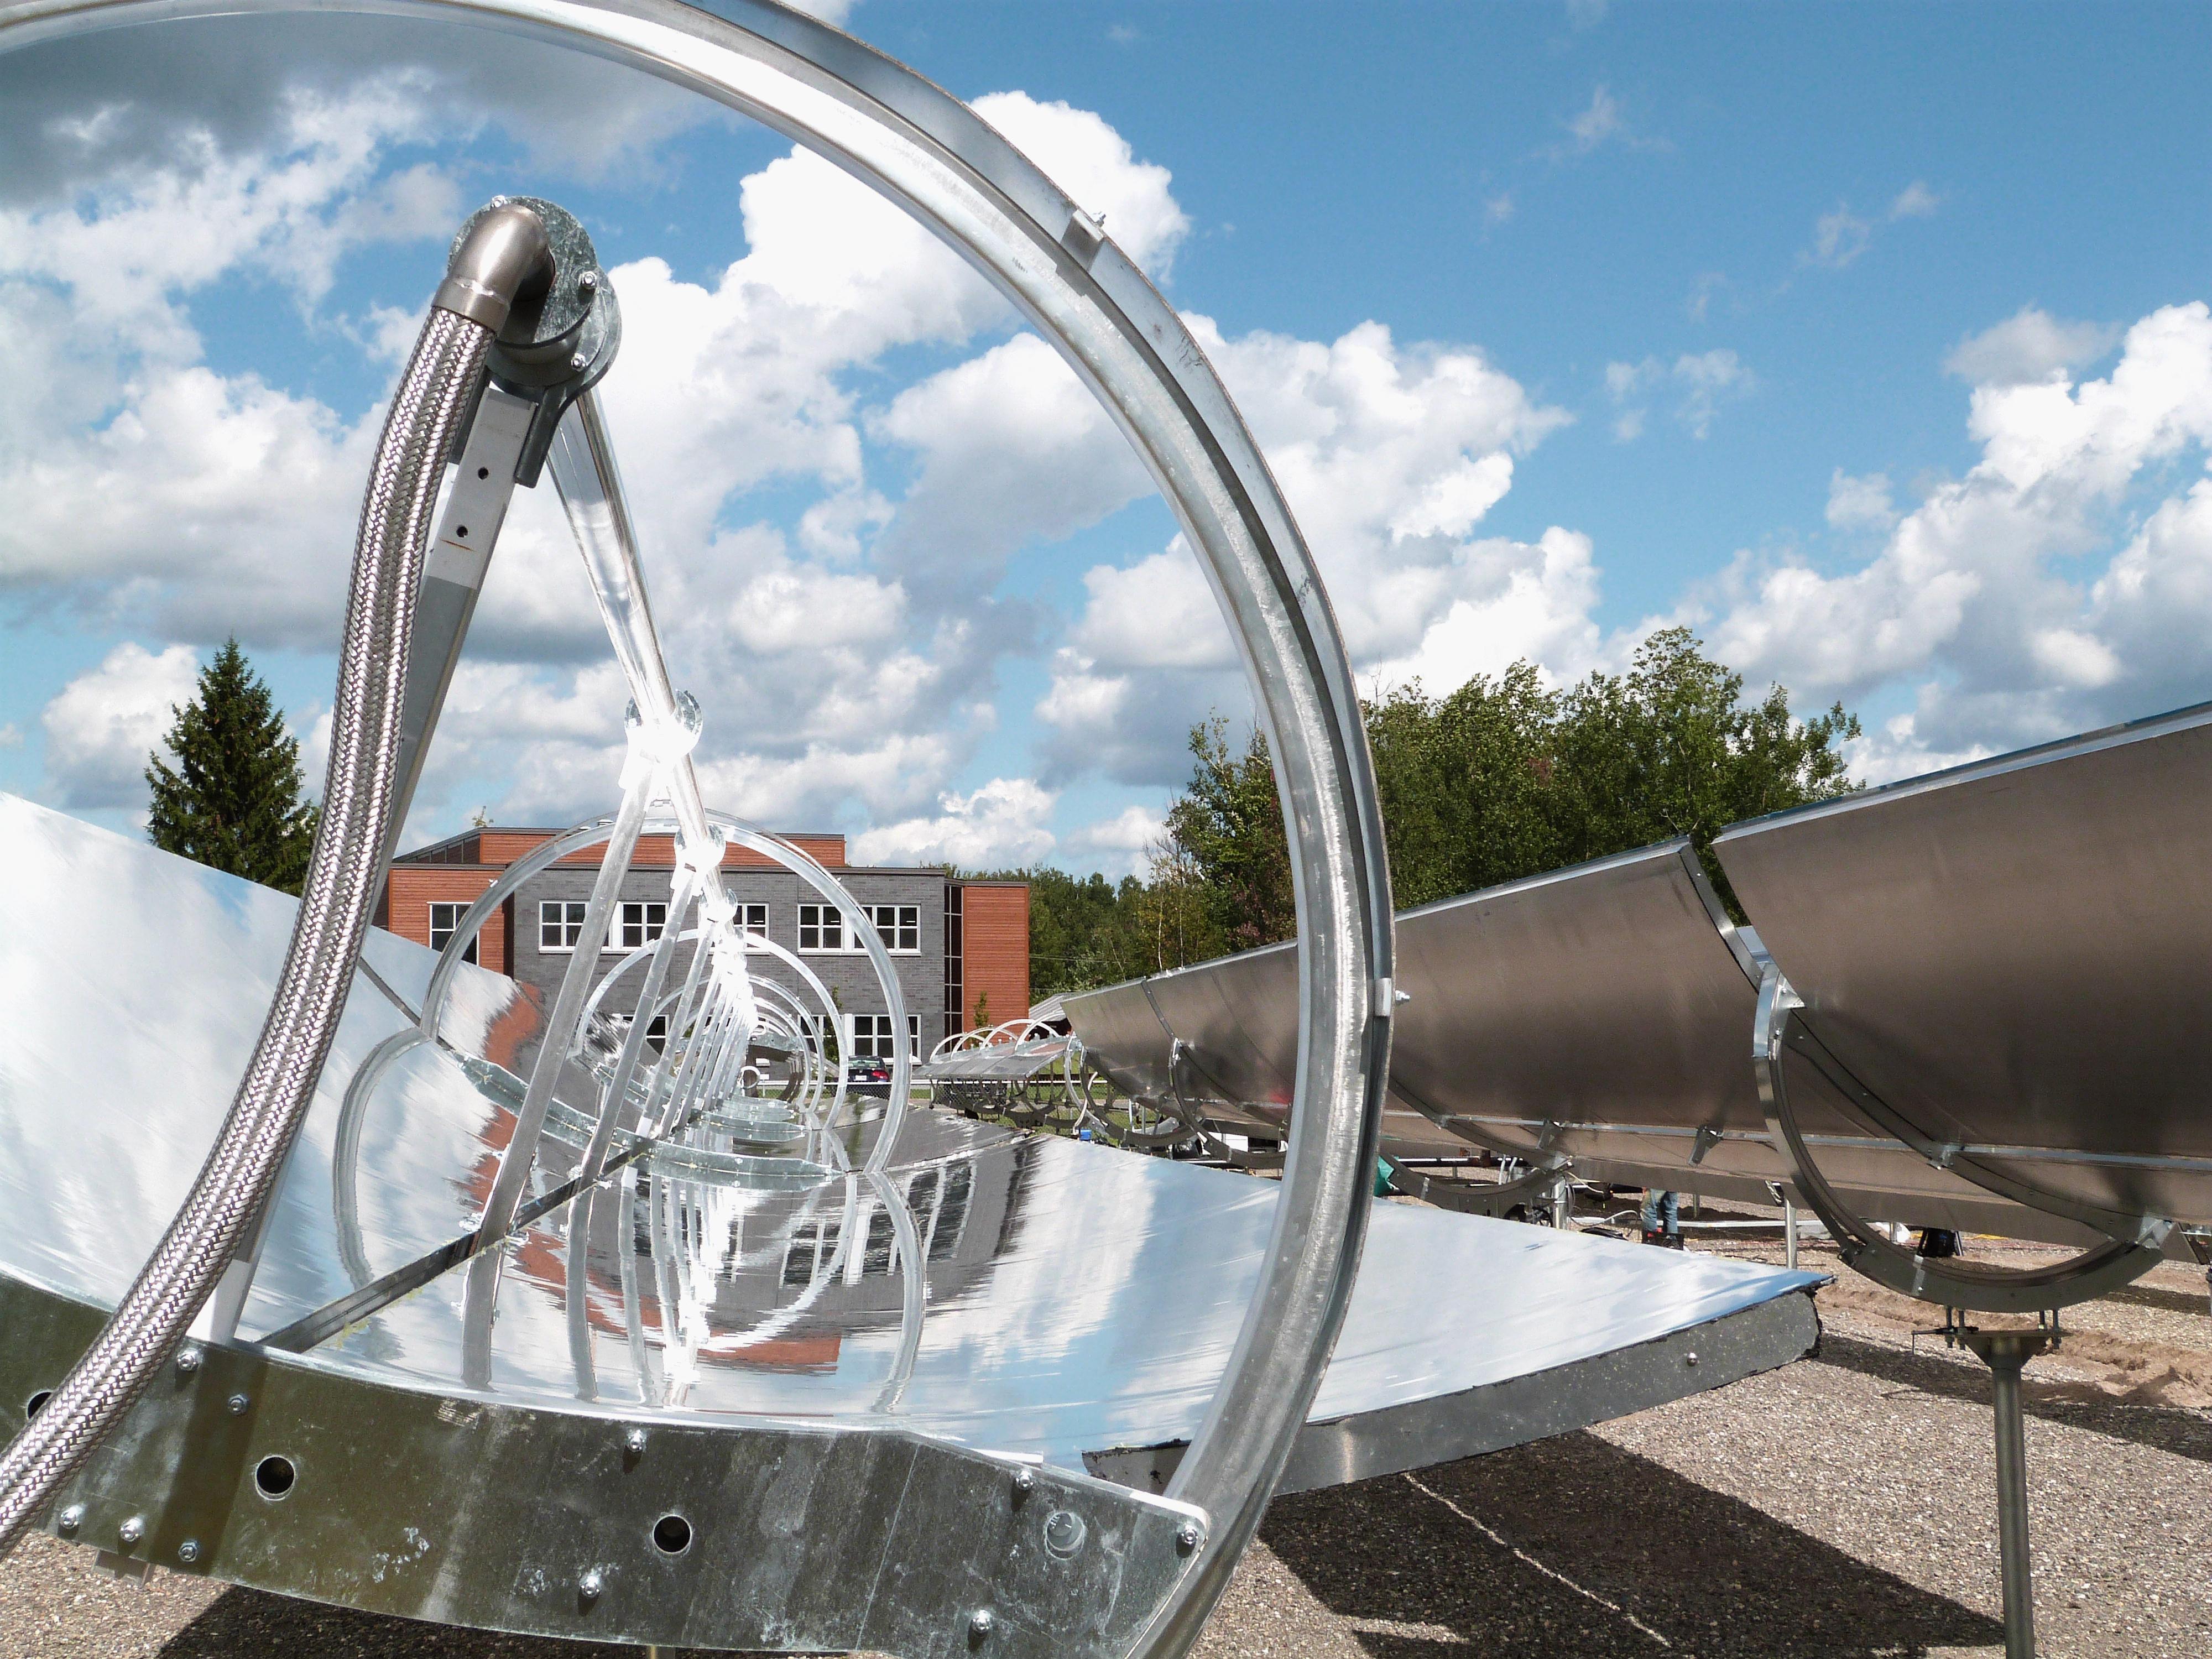 Gallery Smart solar boiler 2